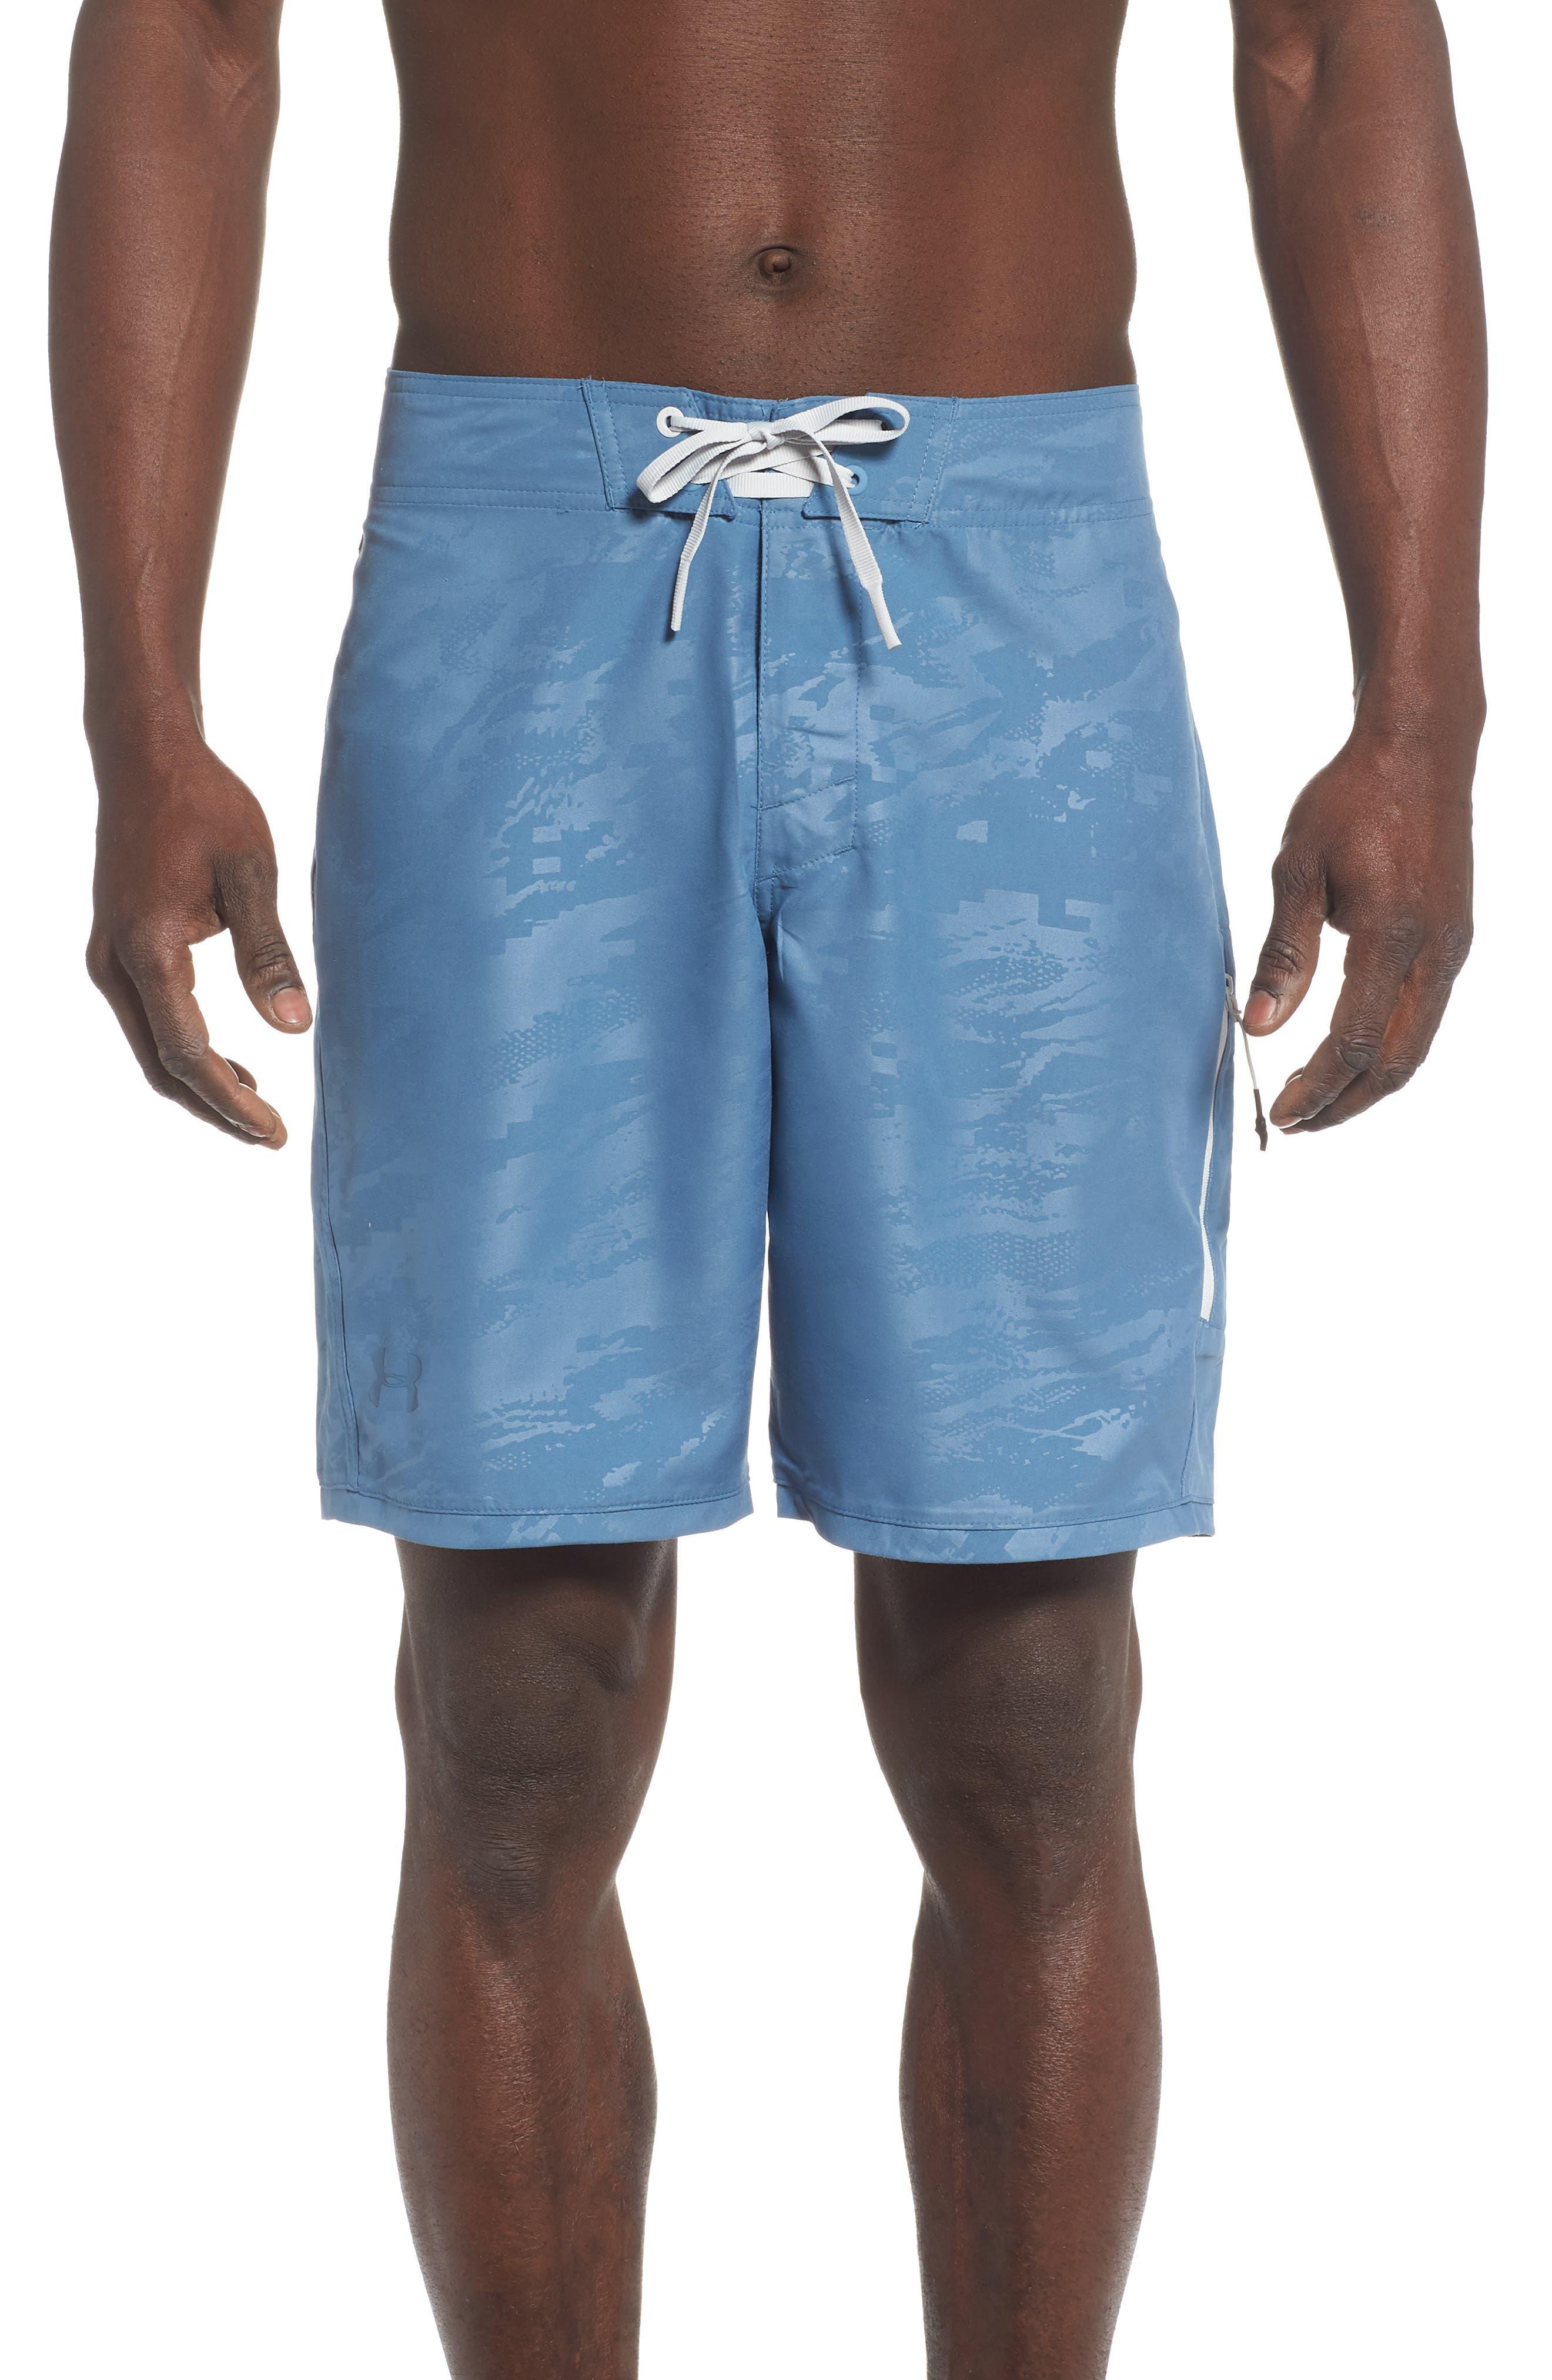 6b4b32ef88 Under Armour Short Break Embossed Board Shorts, Blue